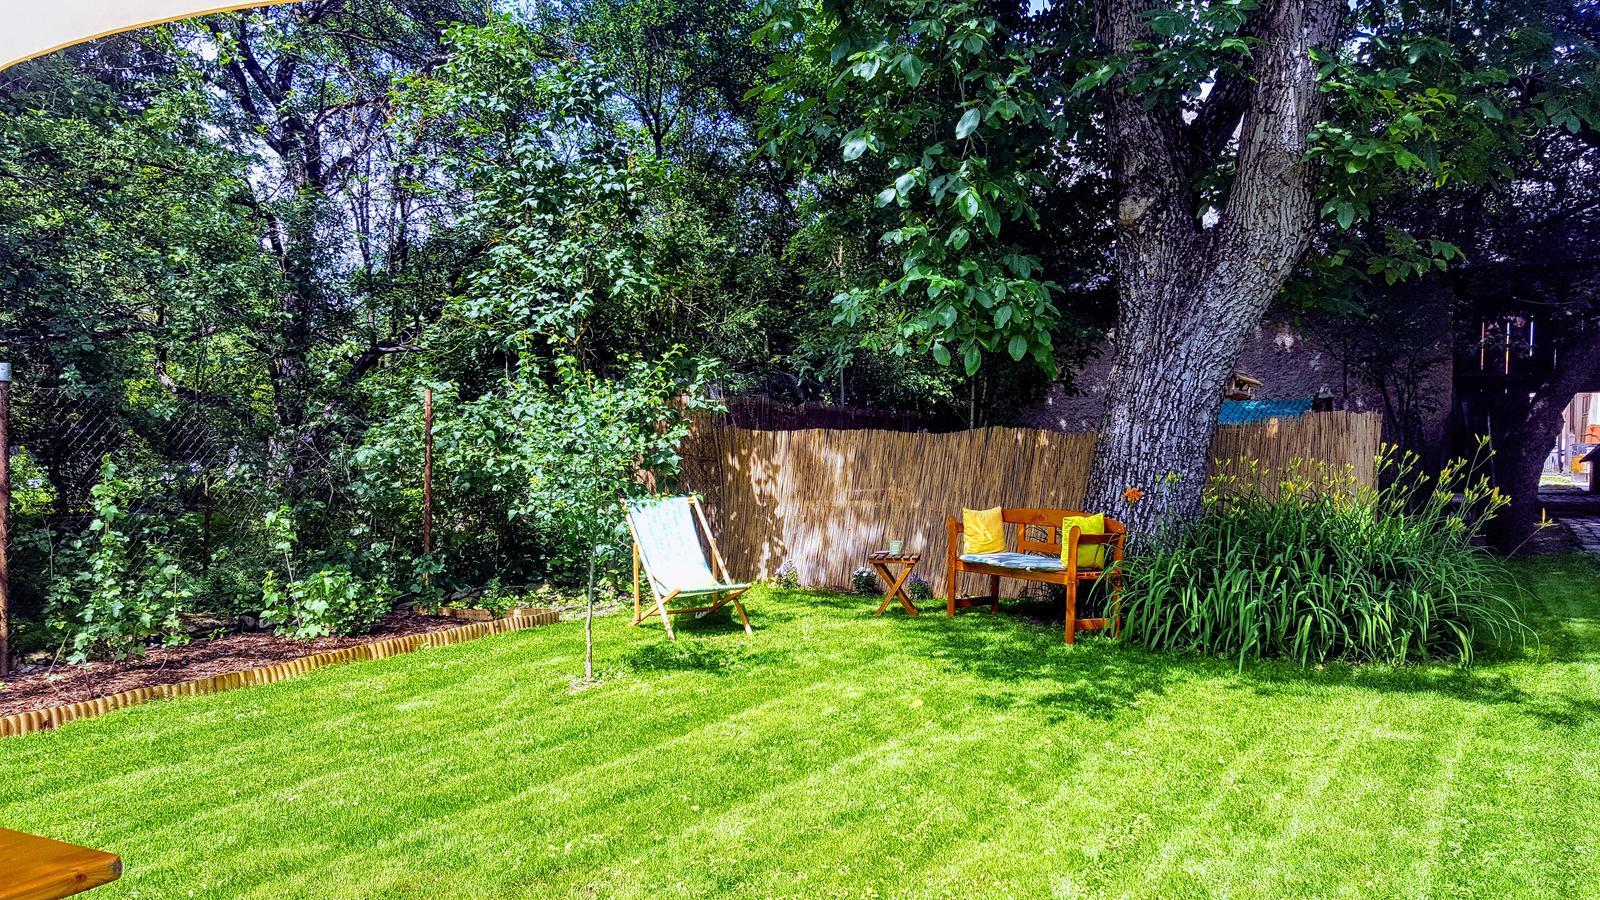 Zahrada a upravy okolo domu - konecne priestor na citanie pod orechom....kolko hejtu som si vypocul o tom ze pod orechom nikdy nic rast nebude a podobne